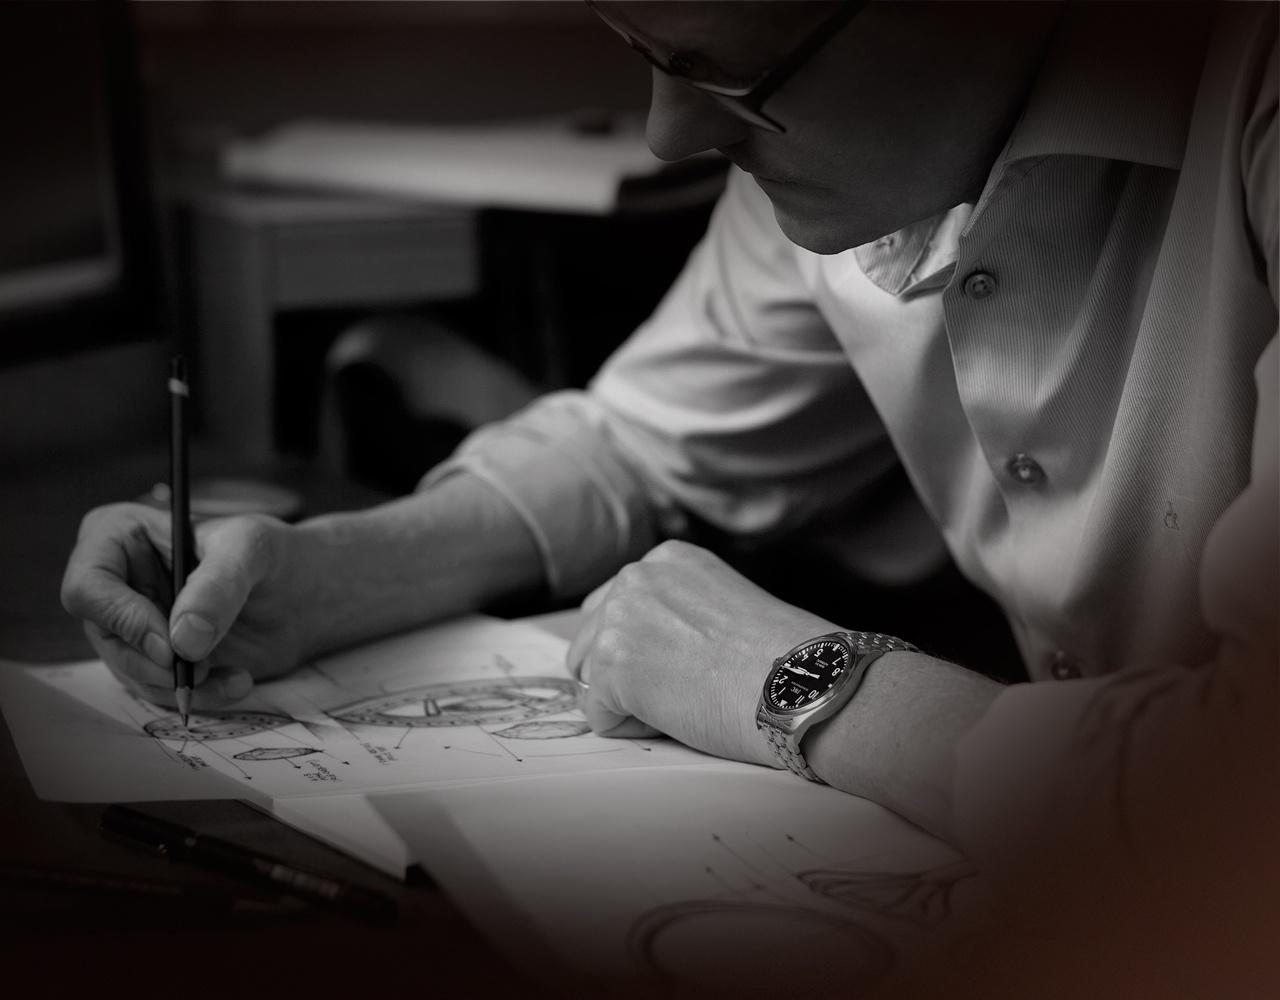 Robin sketching